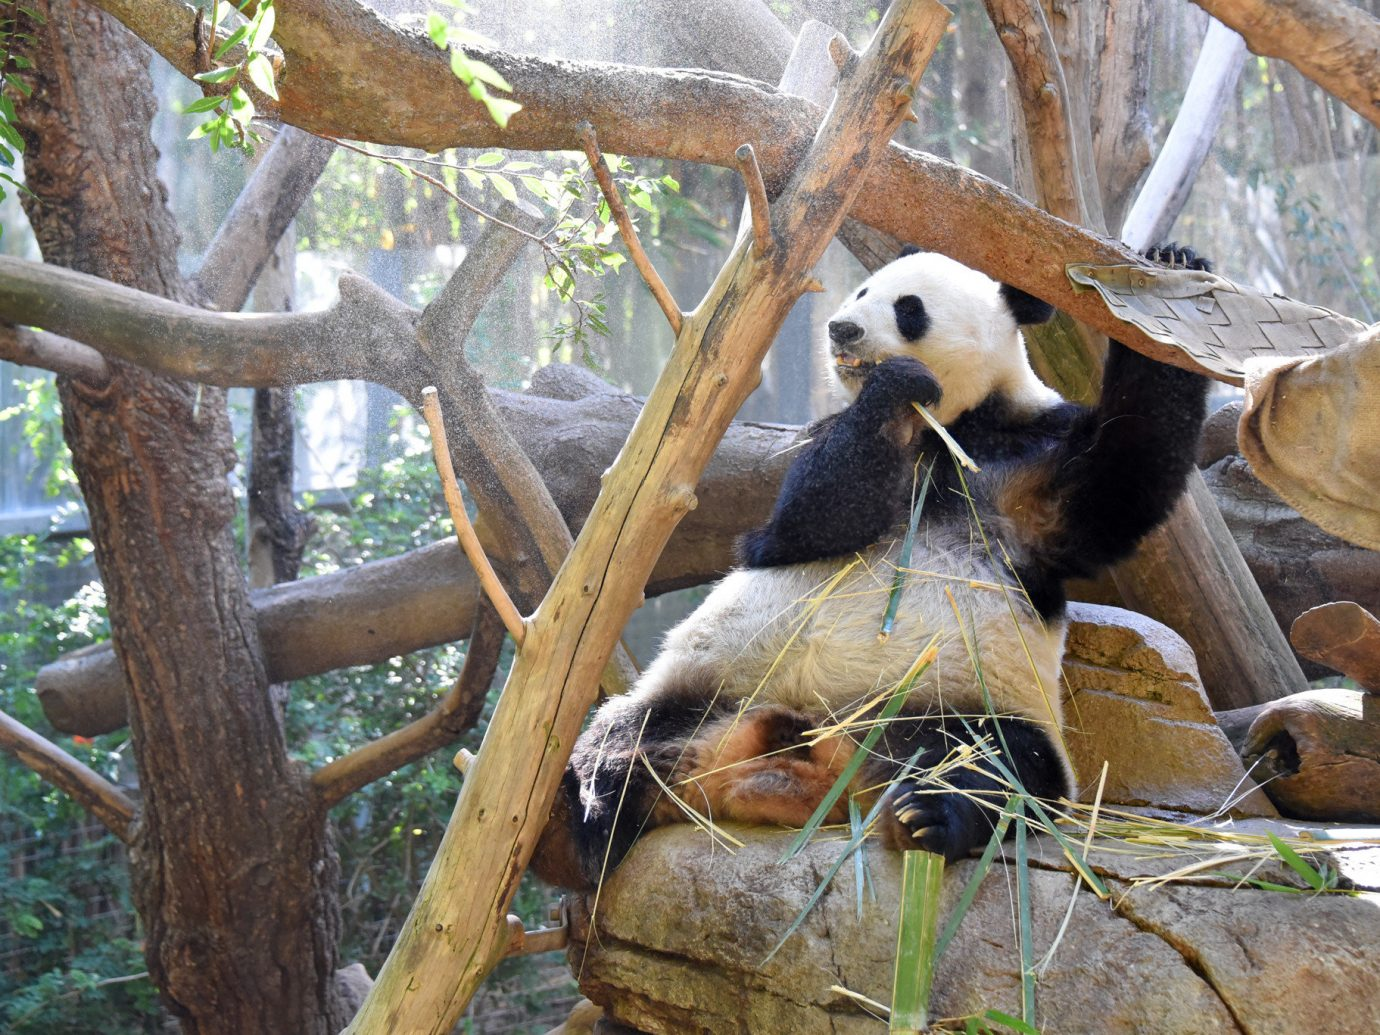 America Trip Ideas Weekend Getaways tree outdoor animal mammal Wildlife giant panda fauna zoo bear outdoor recreation branch recreation trunk